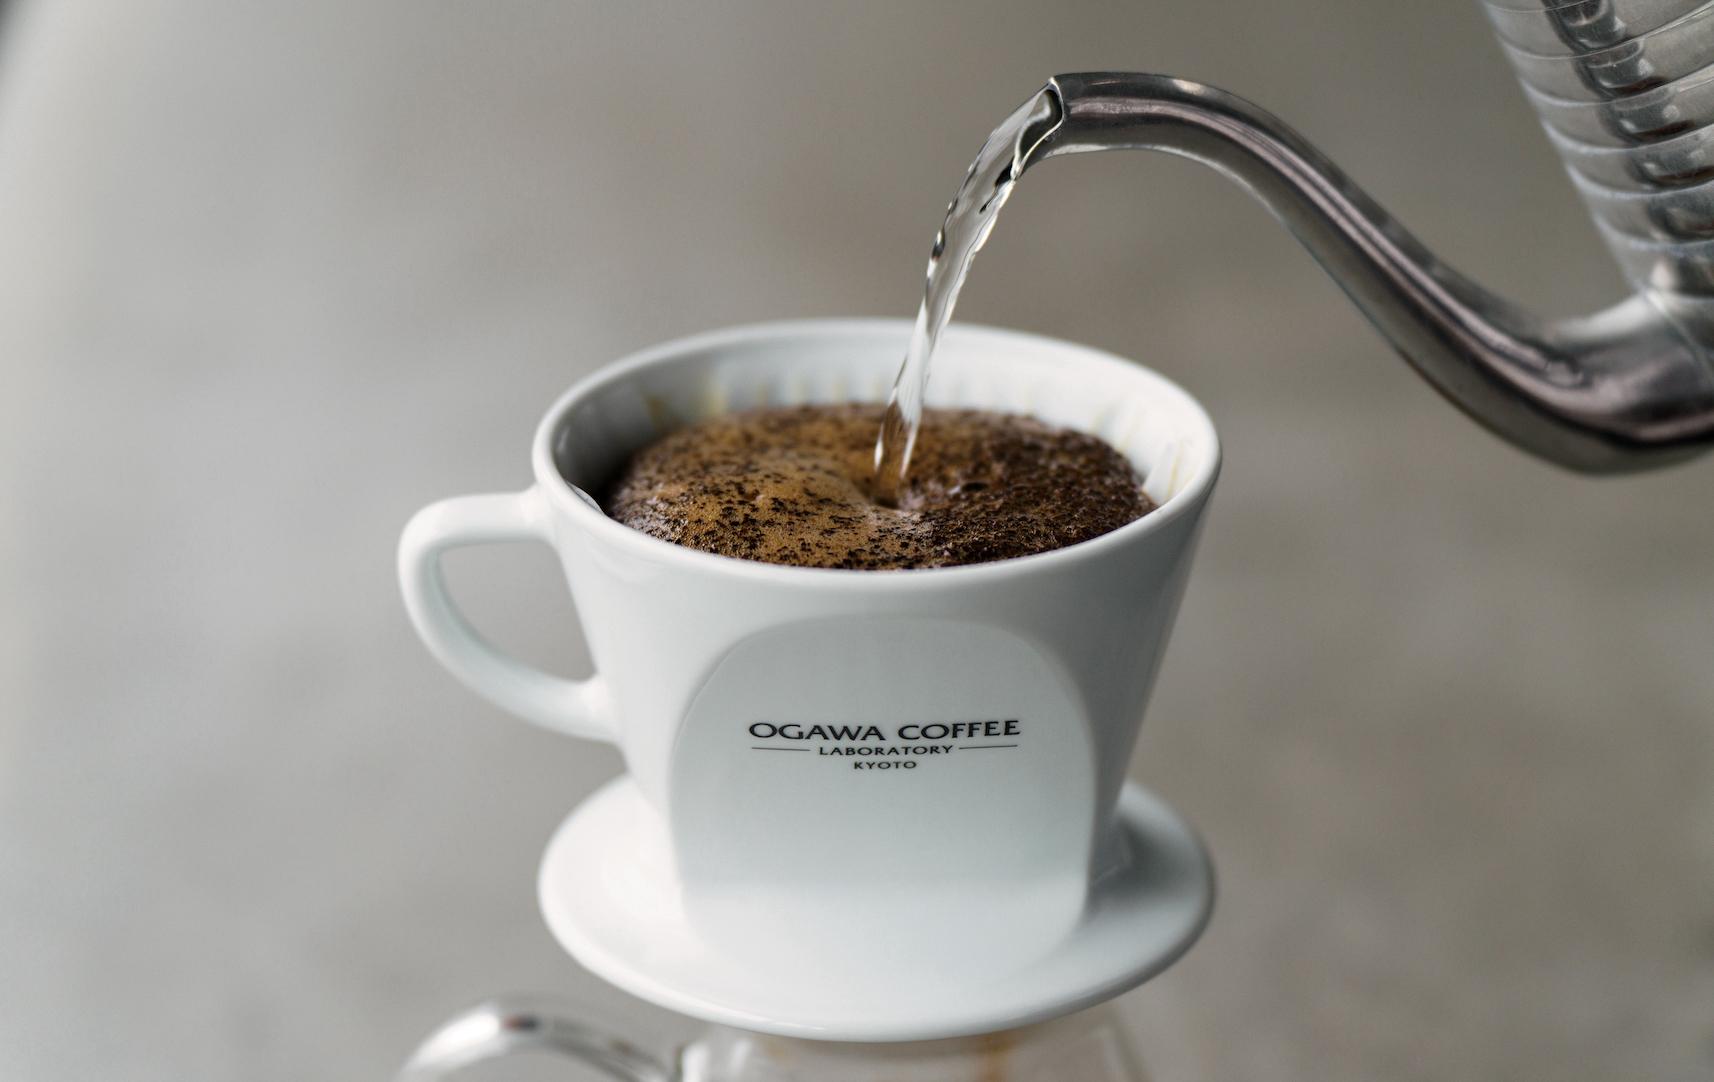 OGAWA COFFEE体験型旗艦店 下北線路街にオープン